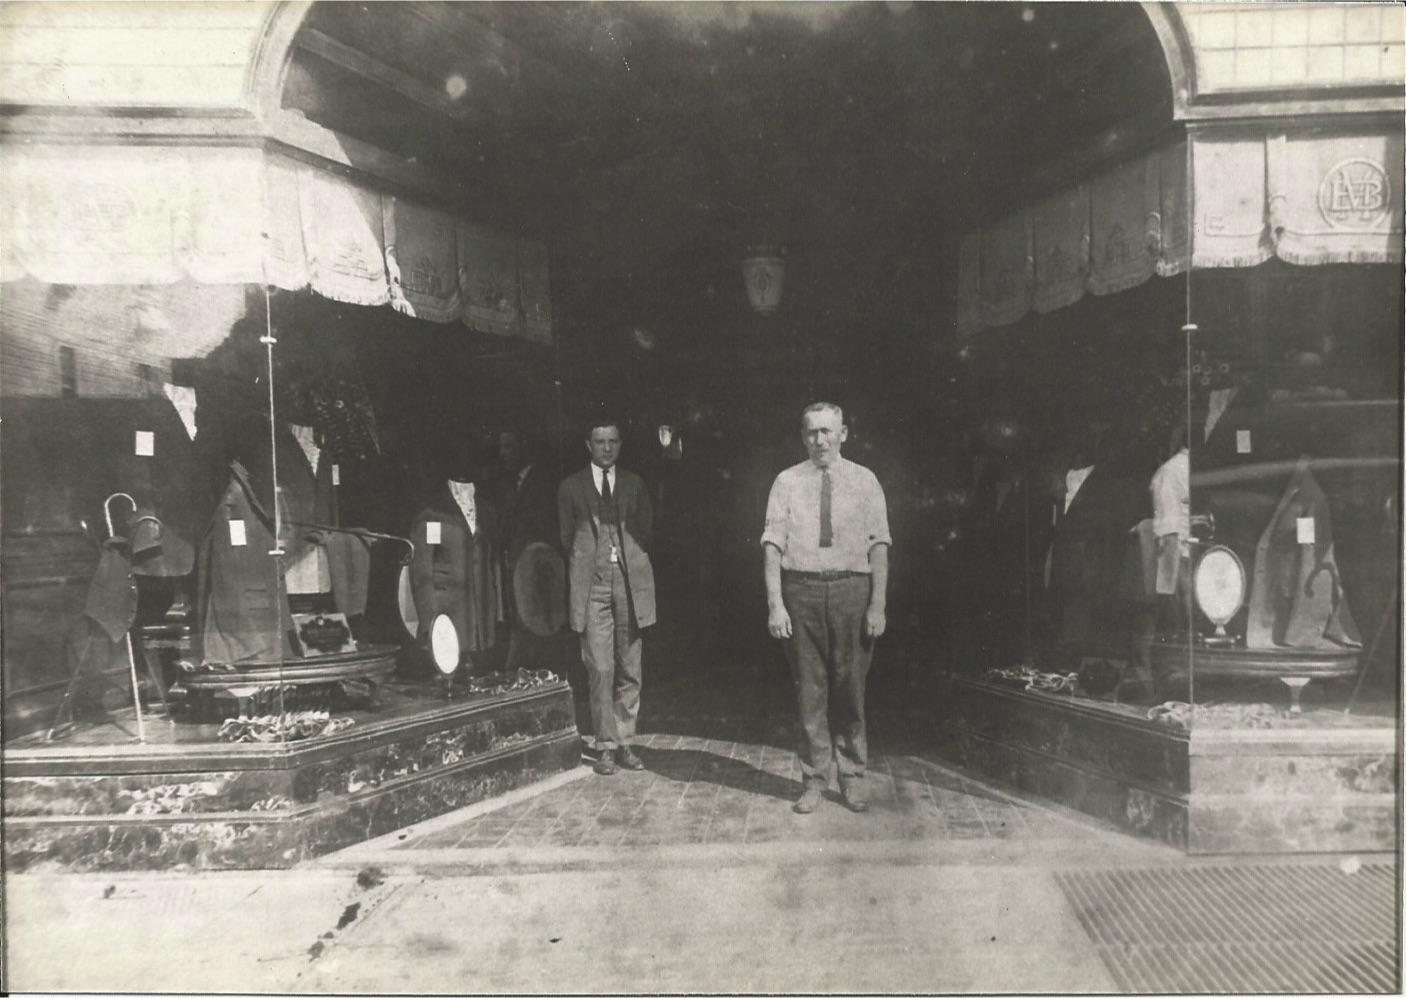 Morris Miller in front of Miller Bros., Pitkin Avenue, Brownsville 1927